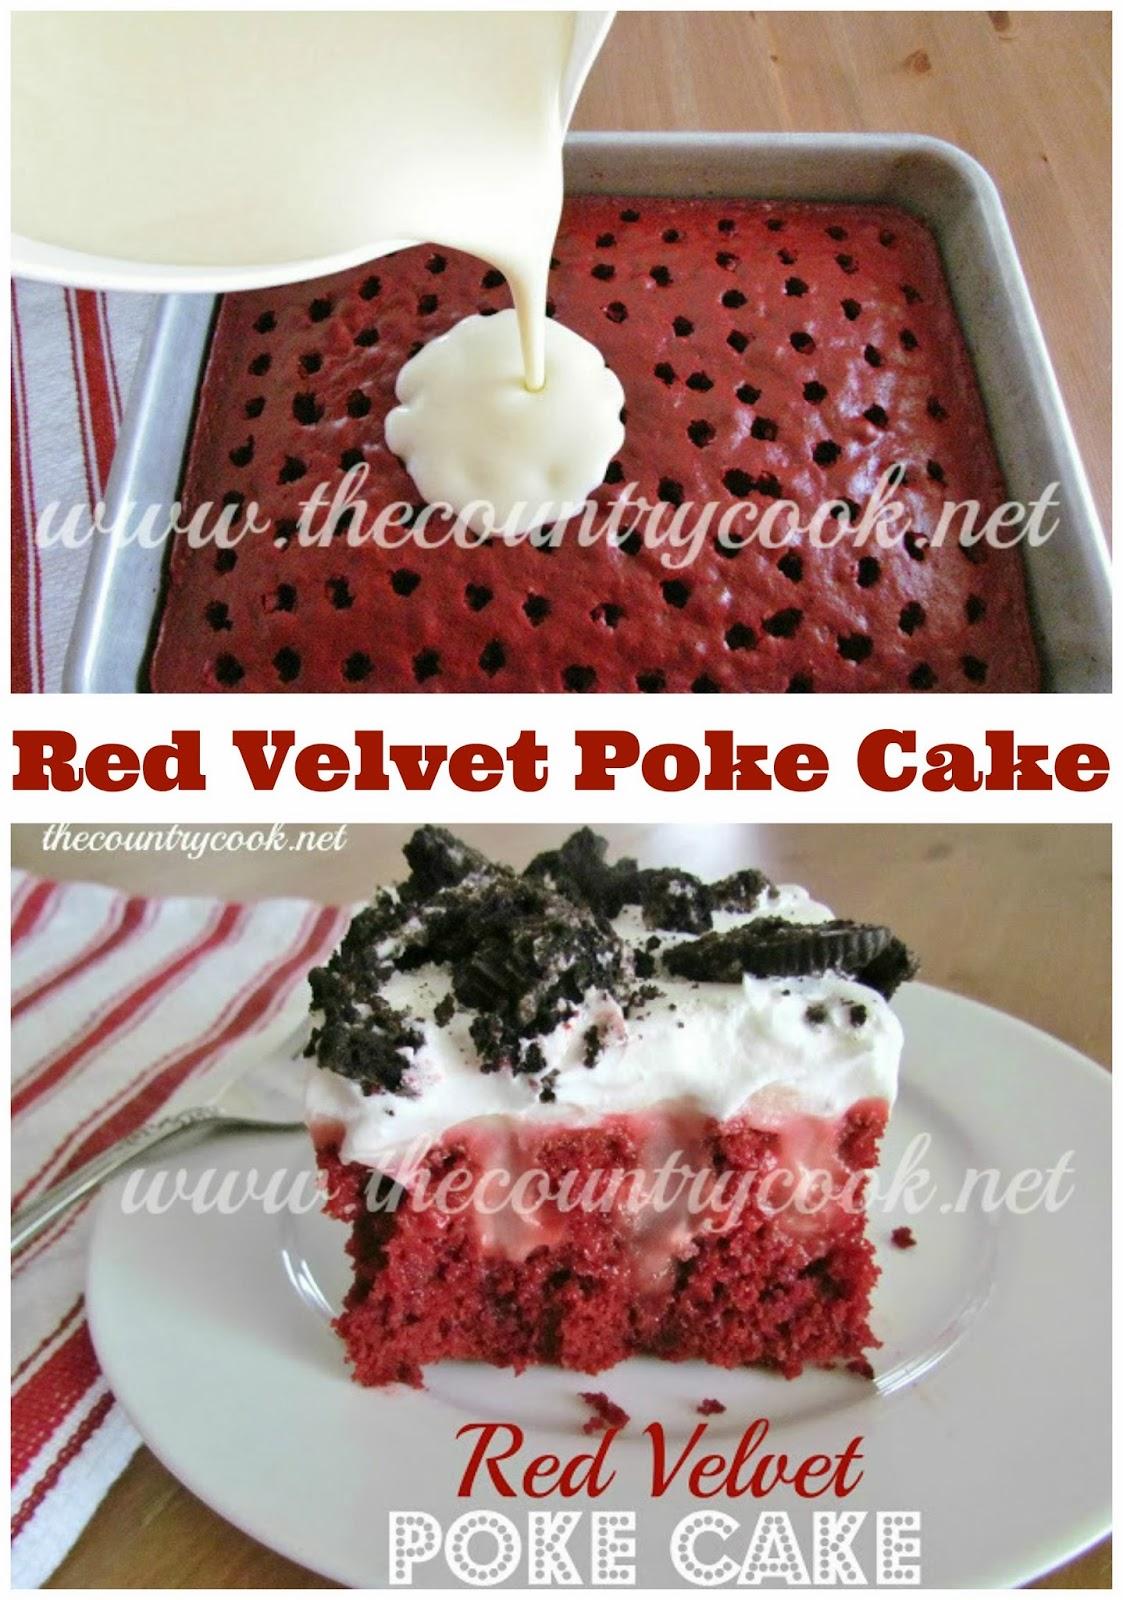 Strawberry Poke Cake With Pudding